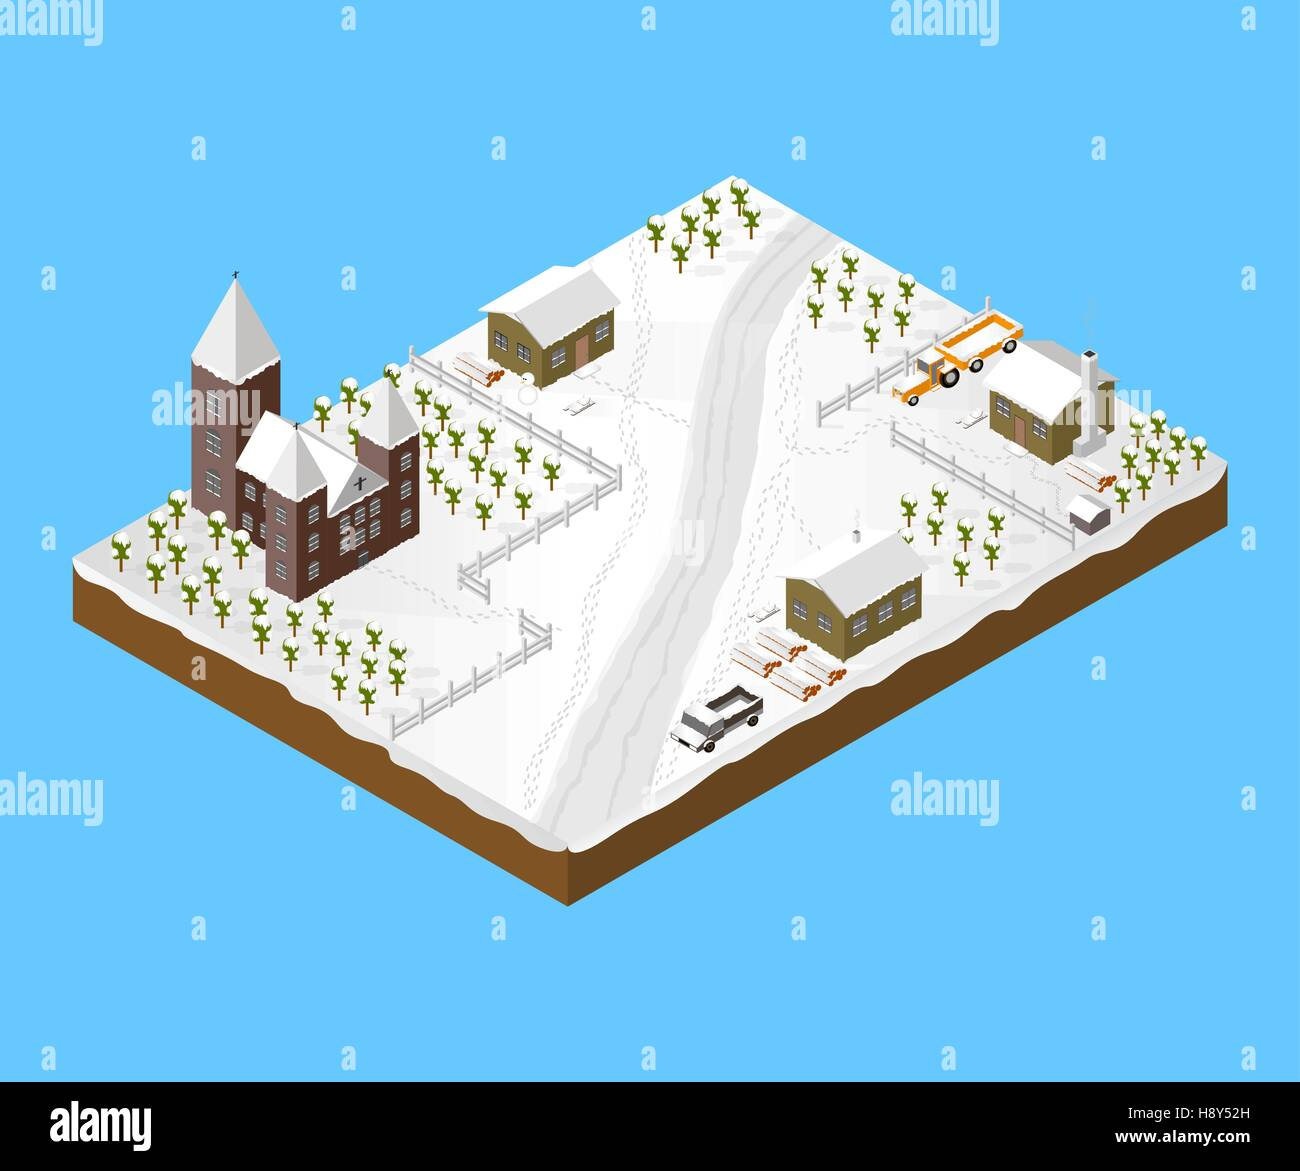 Isometric Snowy Village - Stock Image